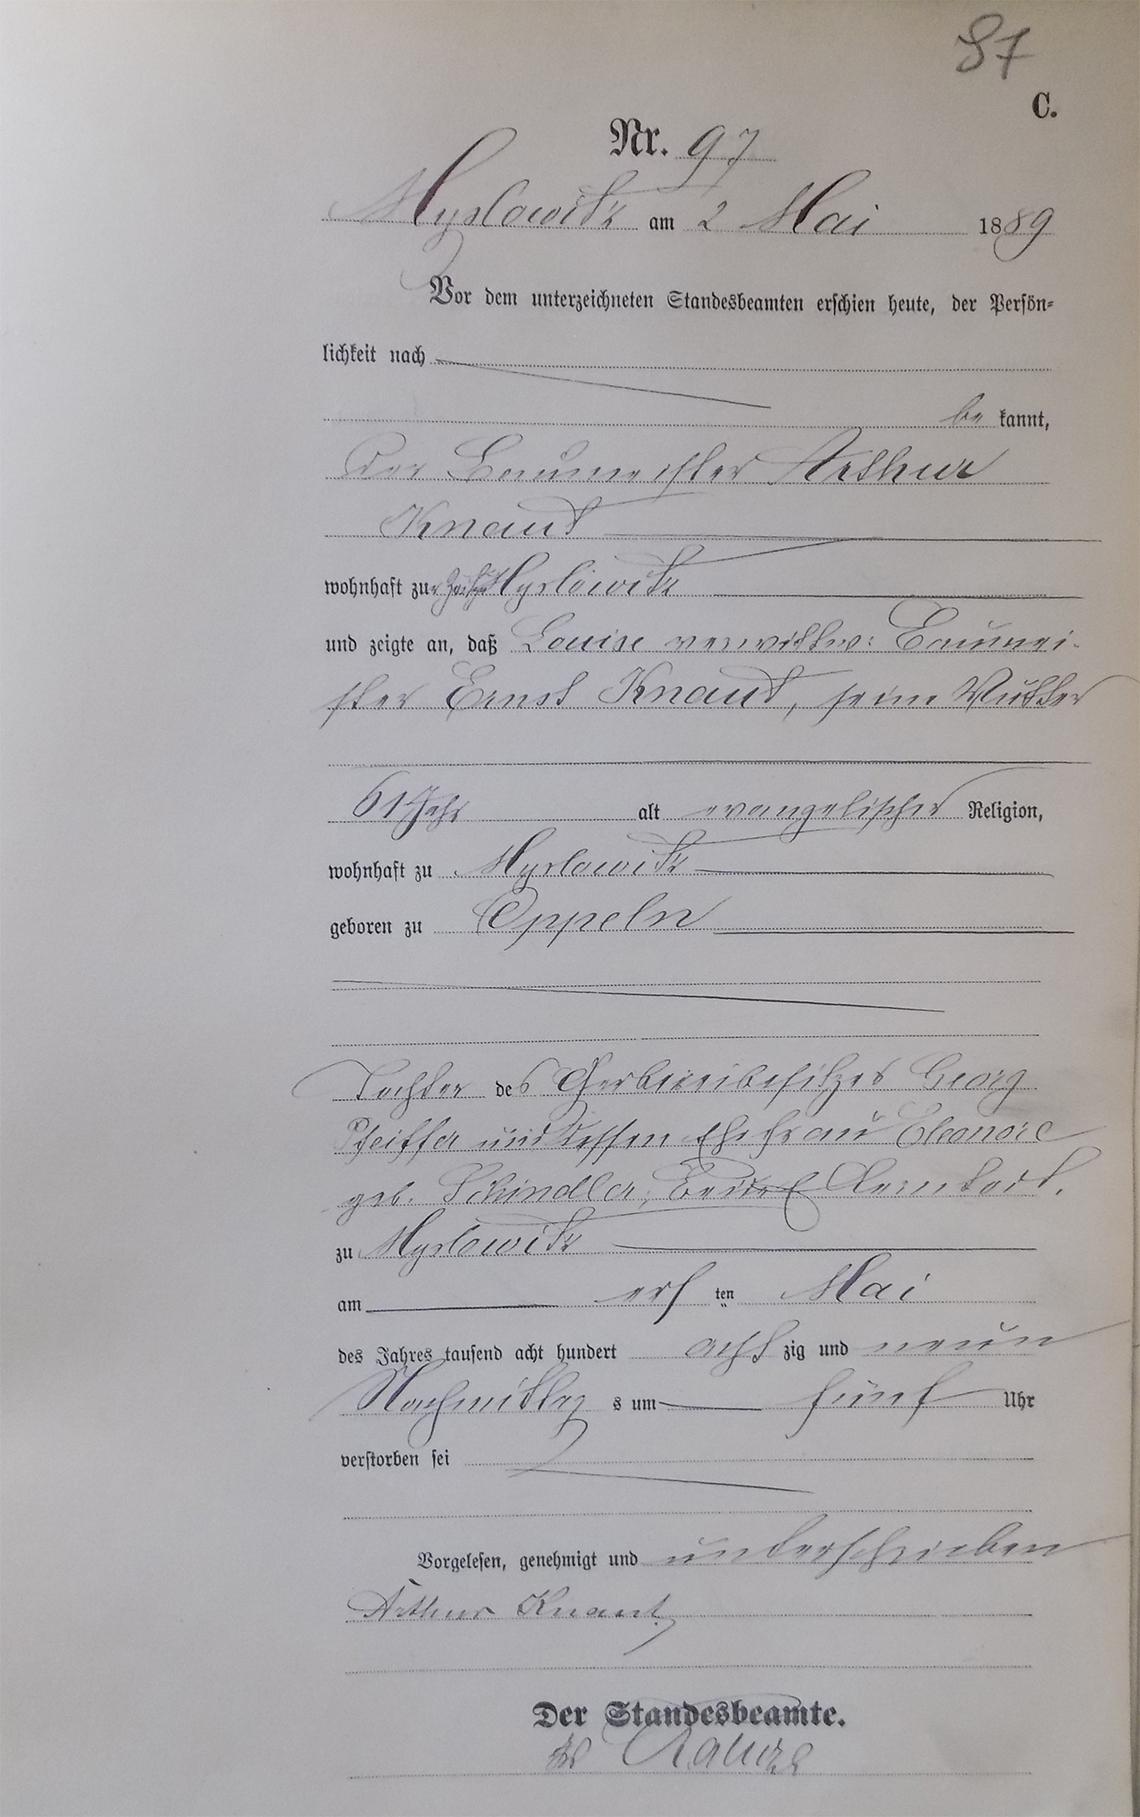 Akt USC zgonu Louise Knaut 01.05.1889 r.